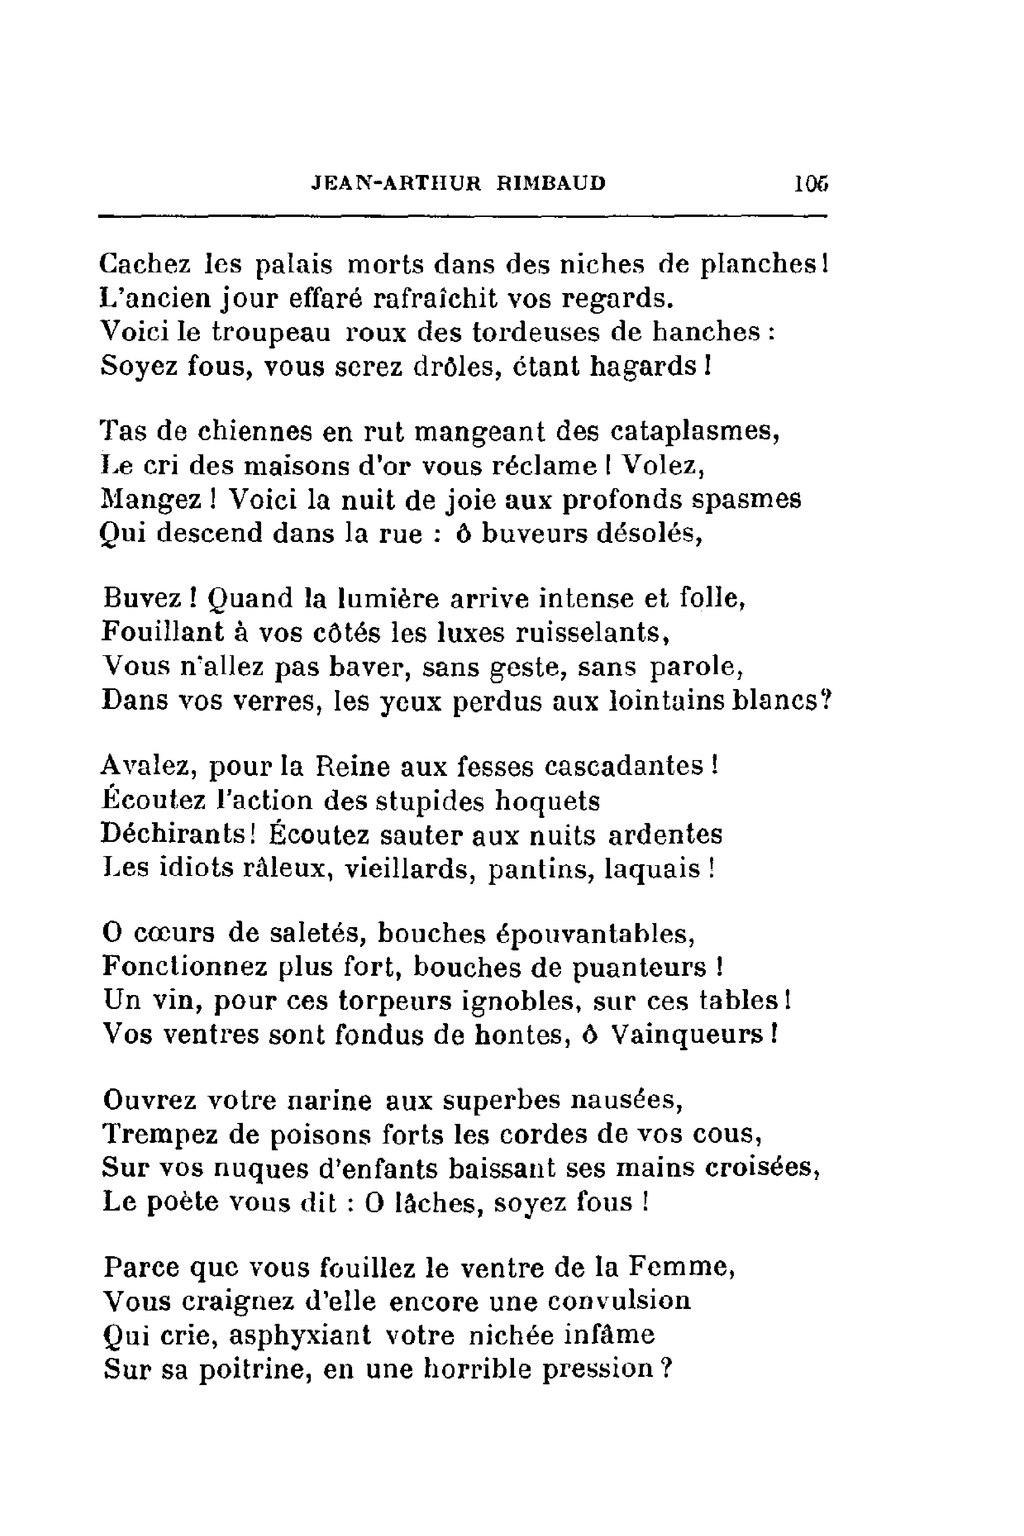 Pageberrichon Jean Arthur Rimbaud 1912djvu103 Wikisource